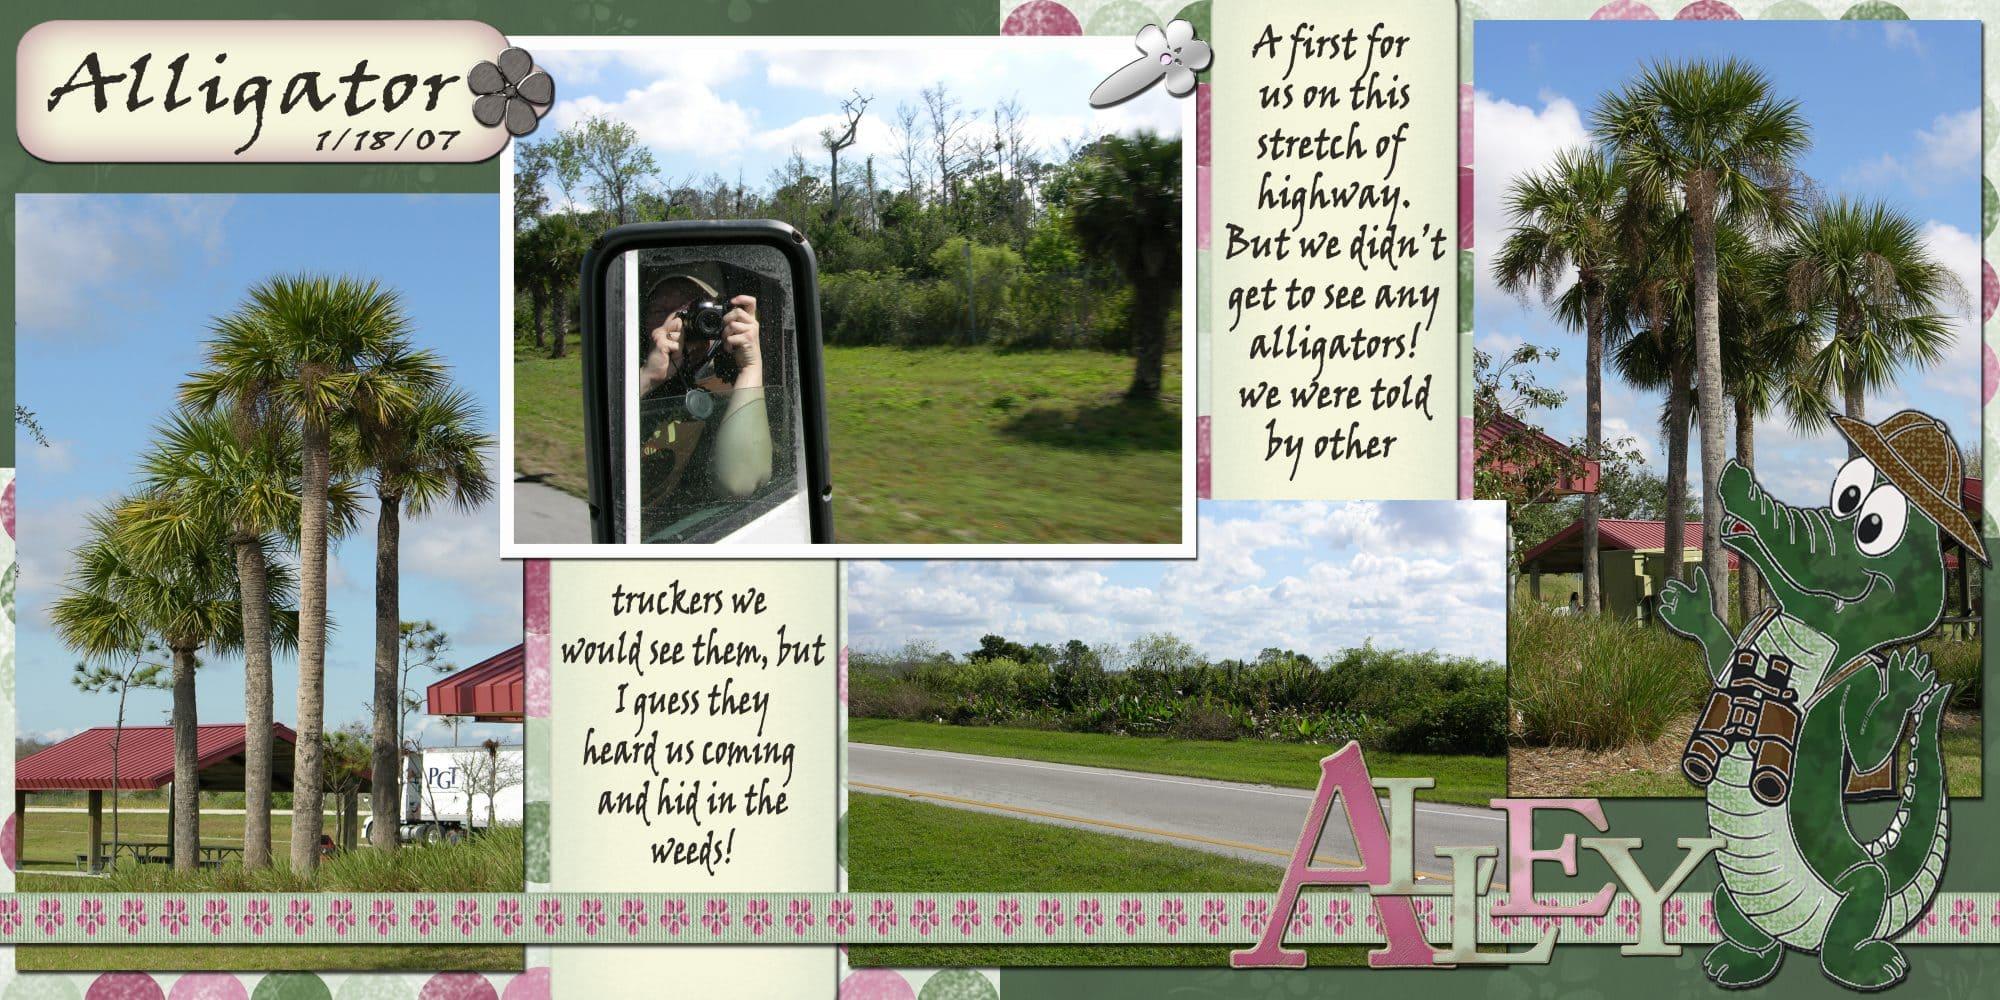 Halifax wedding photographer Sandra Adamson's life on the road as a long hauler driving through alligator alley in Florida.